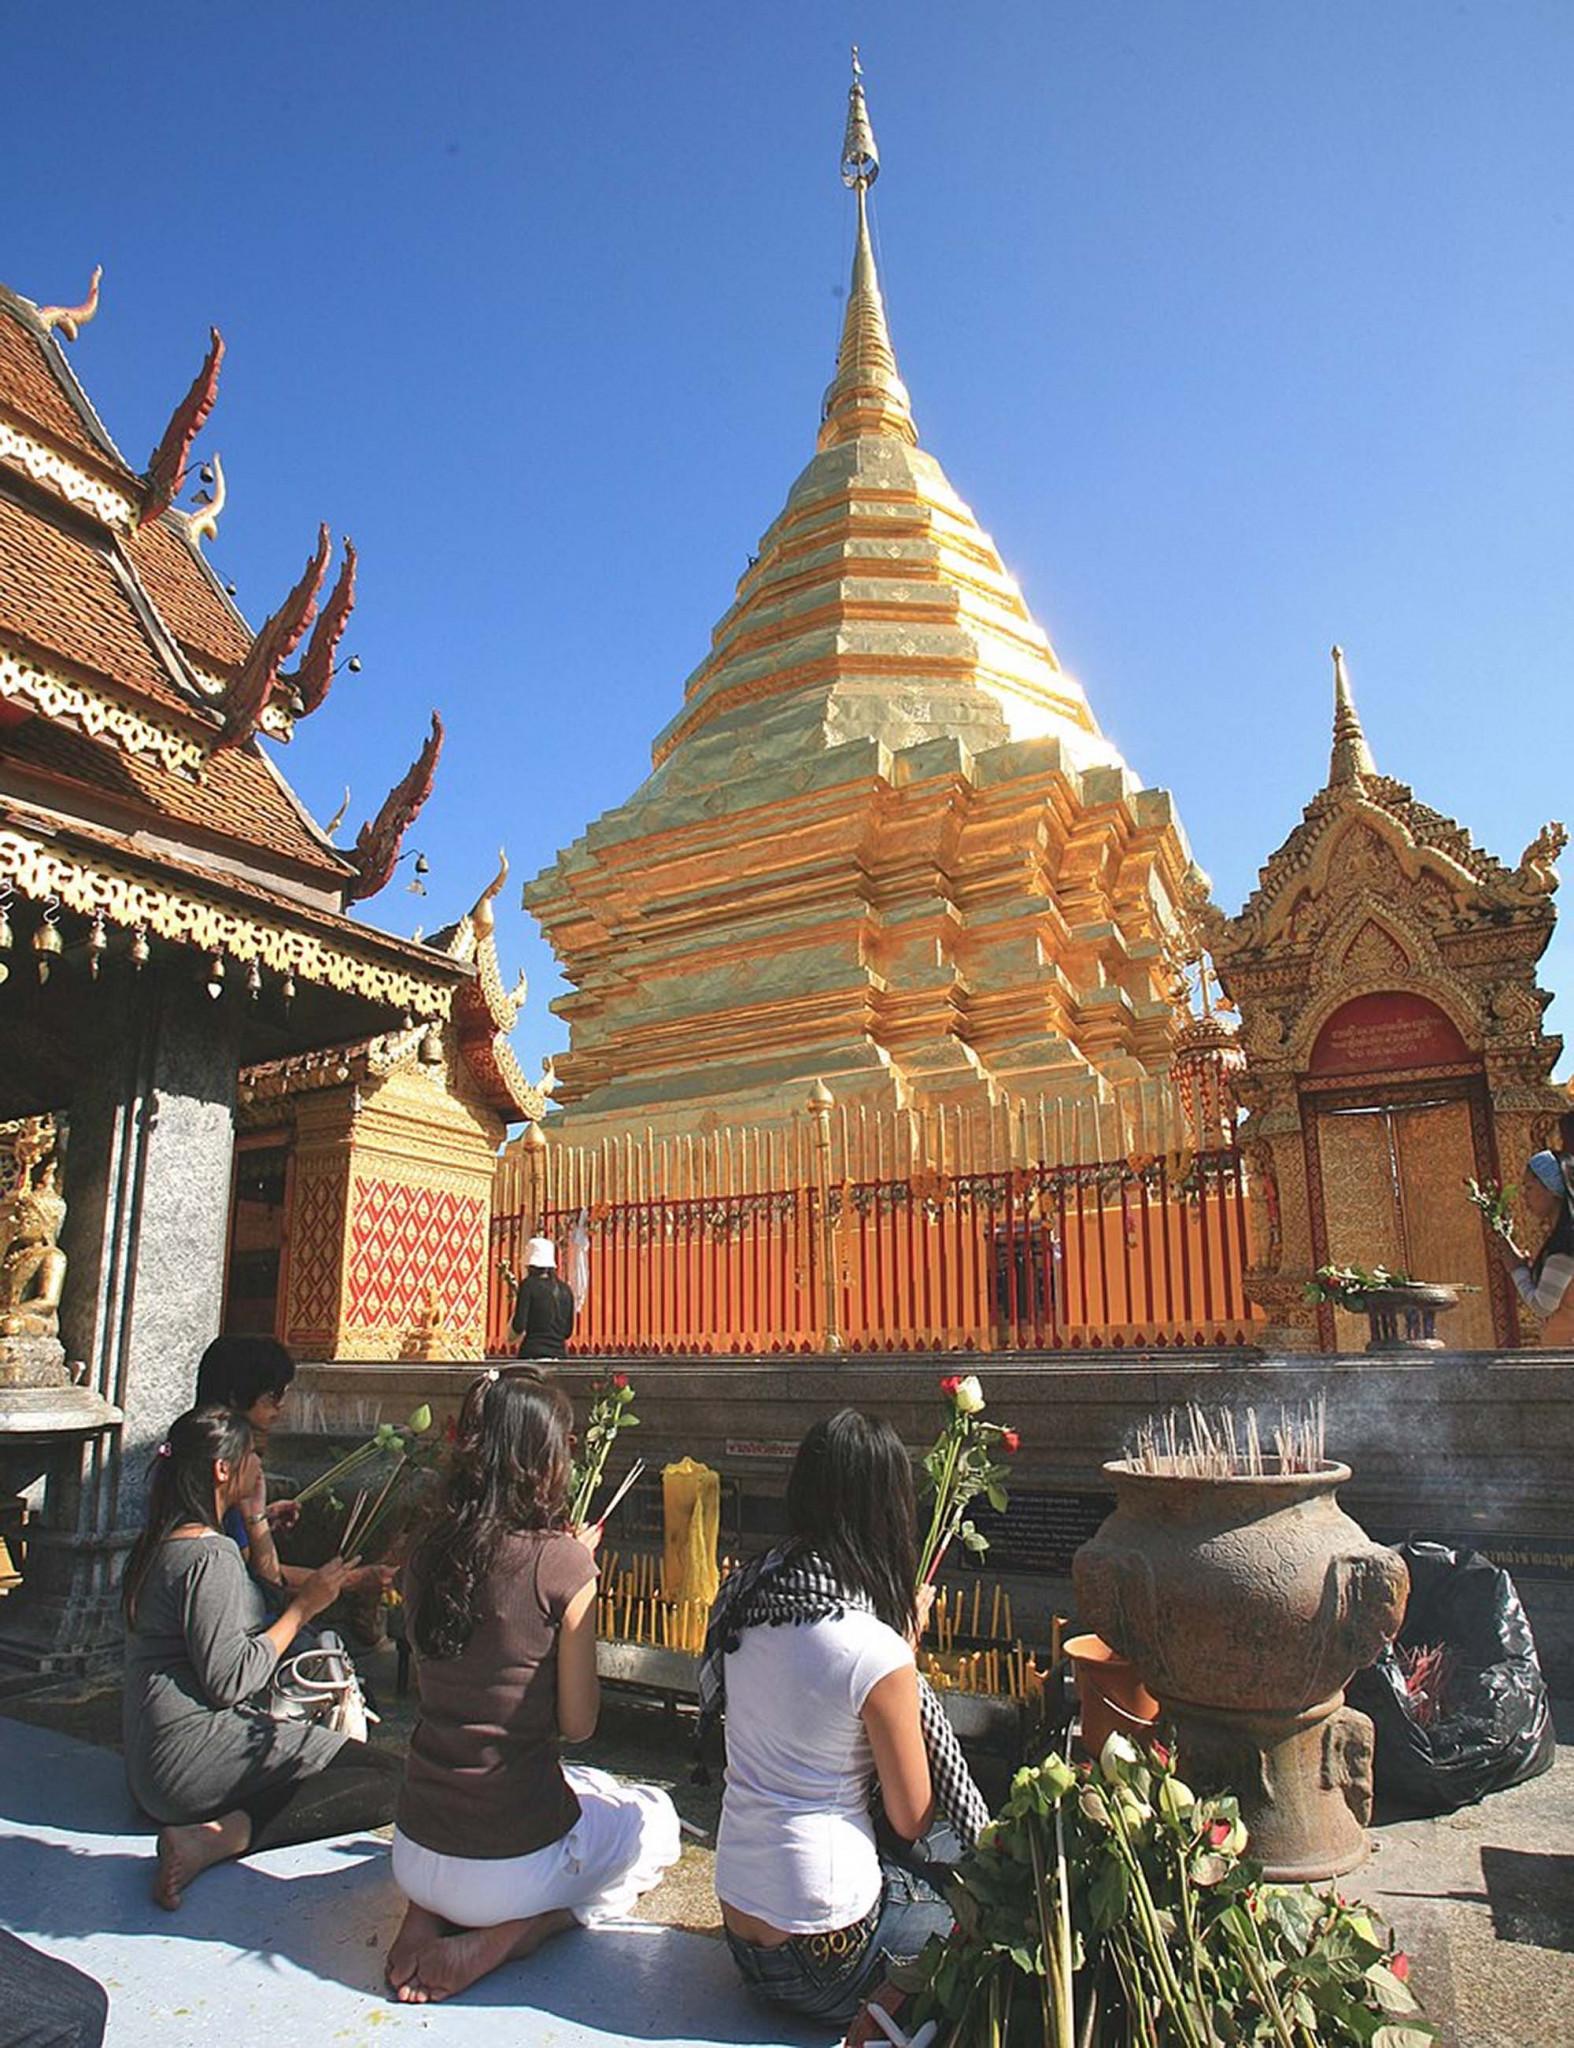 Buddhist laywomen making offerings, Phra That Doi Suthep temple, Chiang Mai province, Thailand